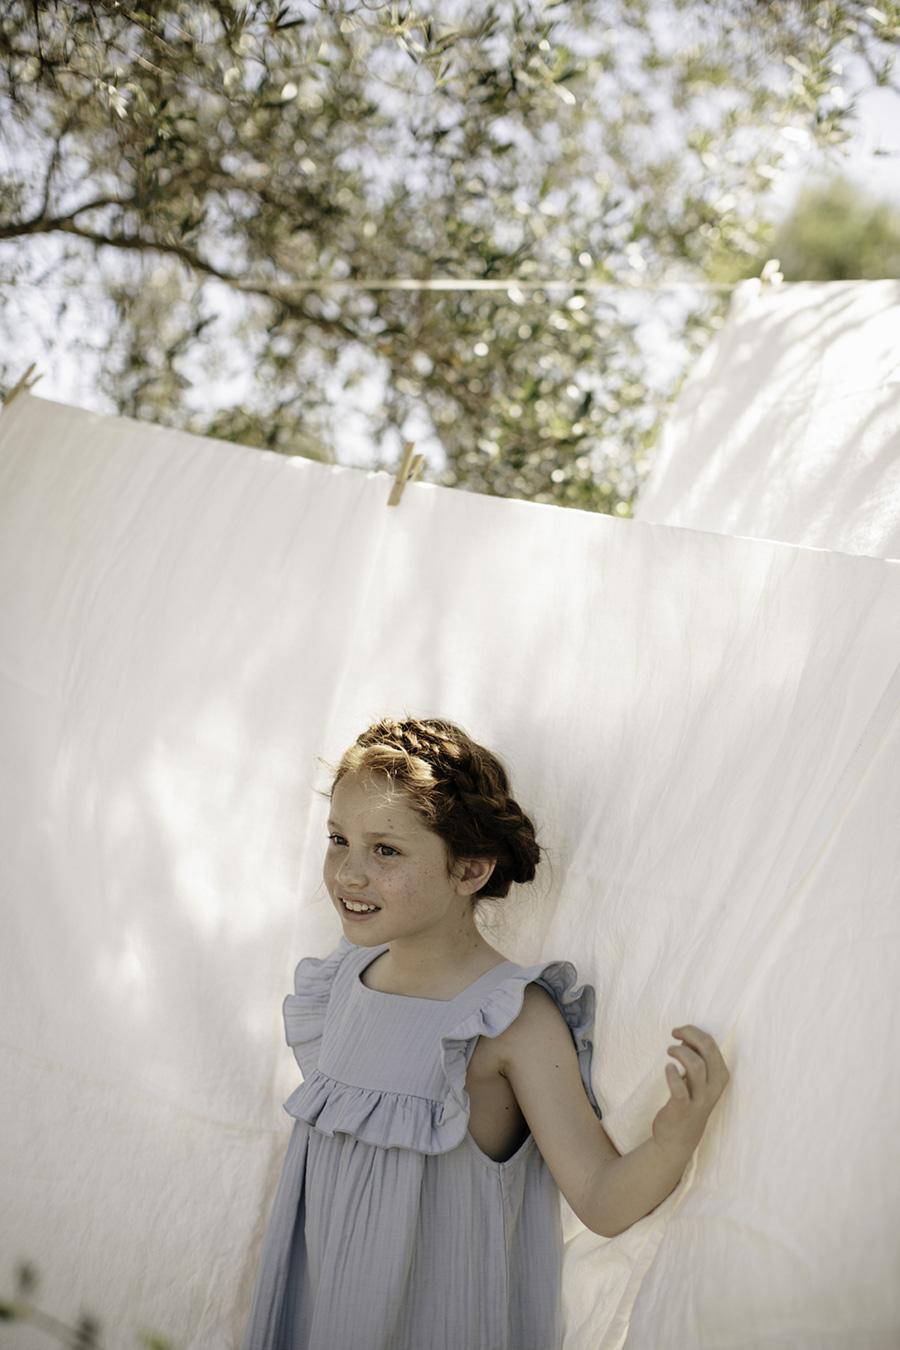 [30%OFF] From germany liilu Lina dress 6-8/8-10/10-12Y Sandy stripesORGANICCOTTON